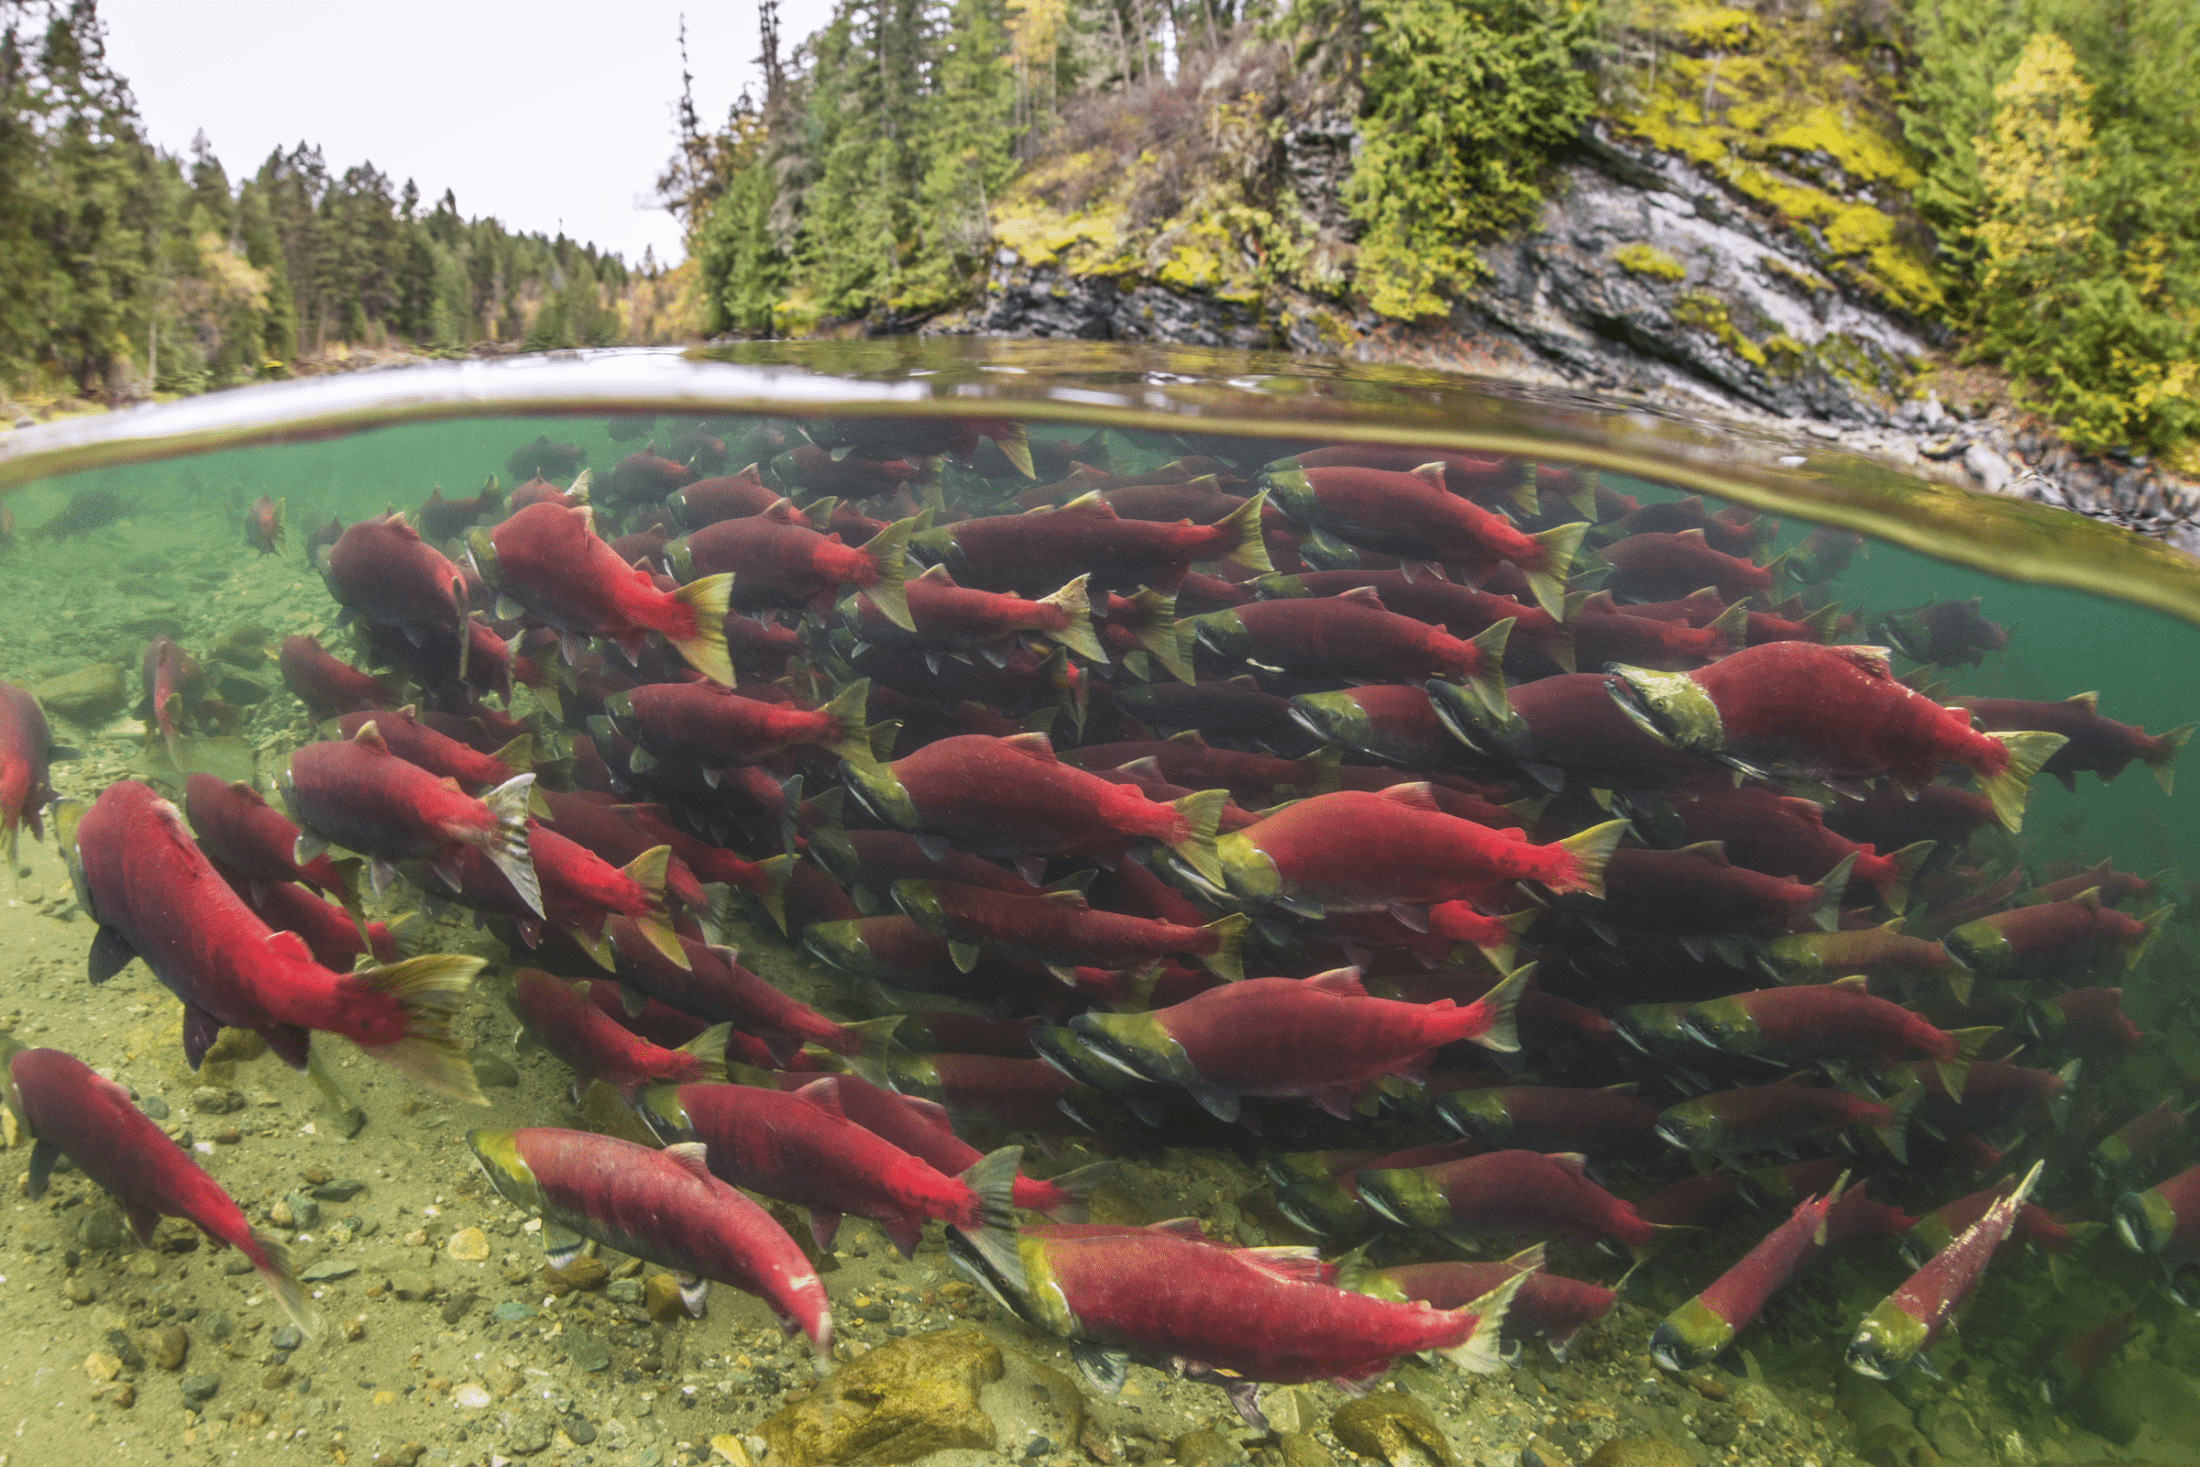 Wild sockeye salmon BC Tavish Campbell